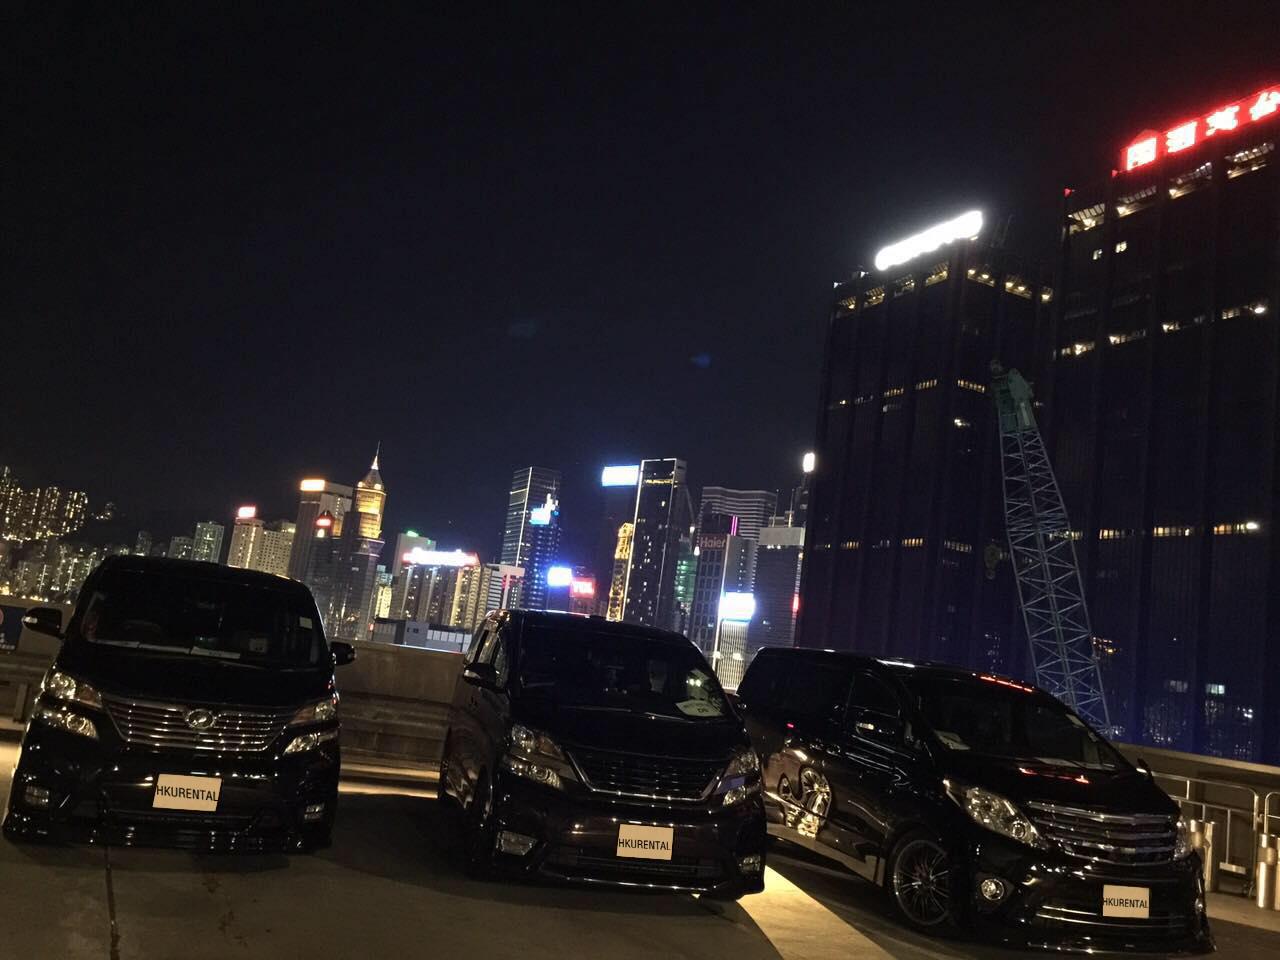 KURENTA HKURENTA KURENTA,car,night,mode of transport,luxury vehicle,metropolitan area